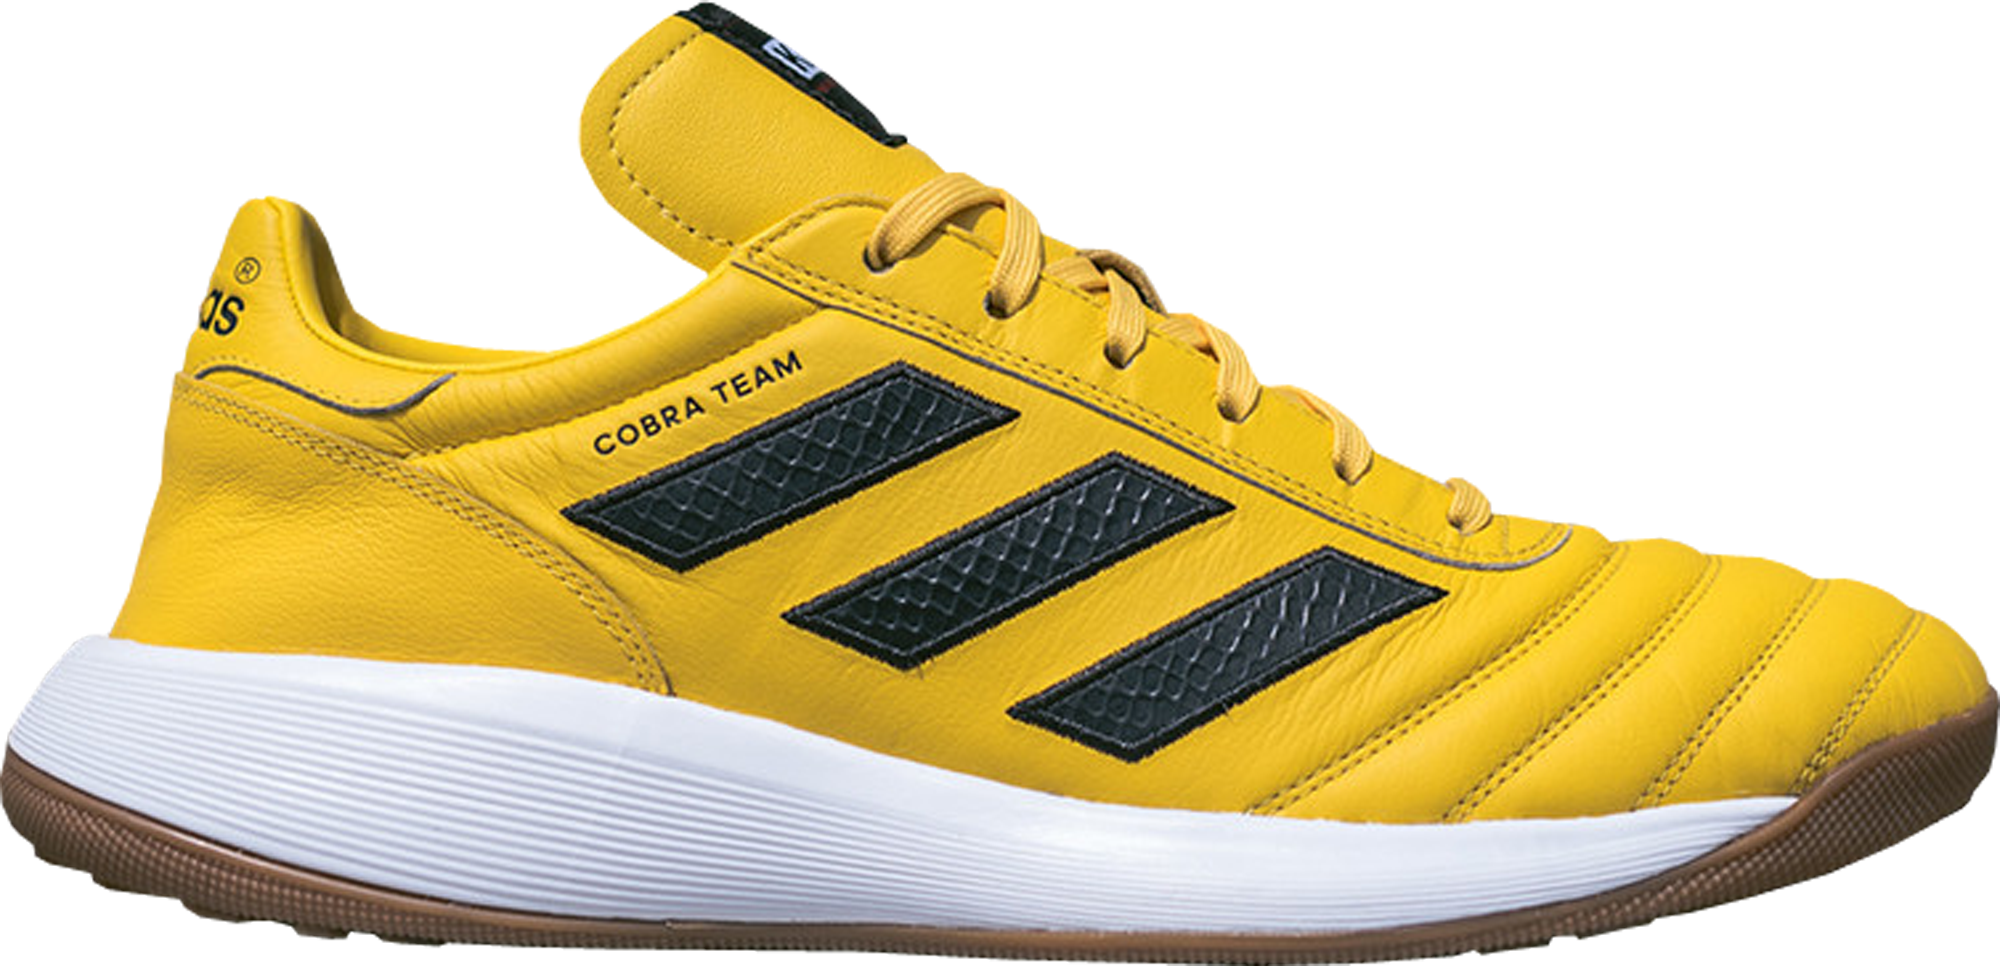 adidas Copa Mundial Turf Trainer Kith Cobras